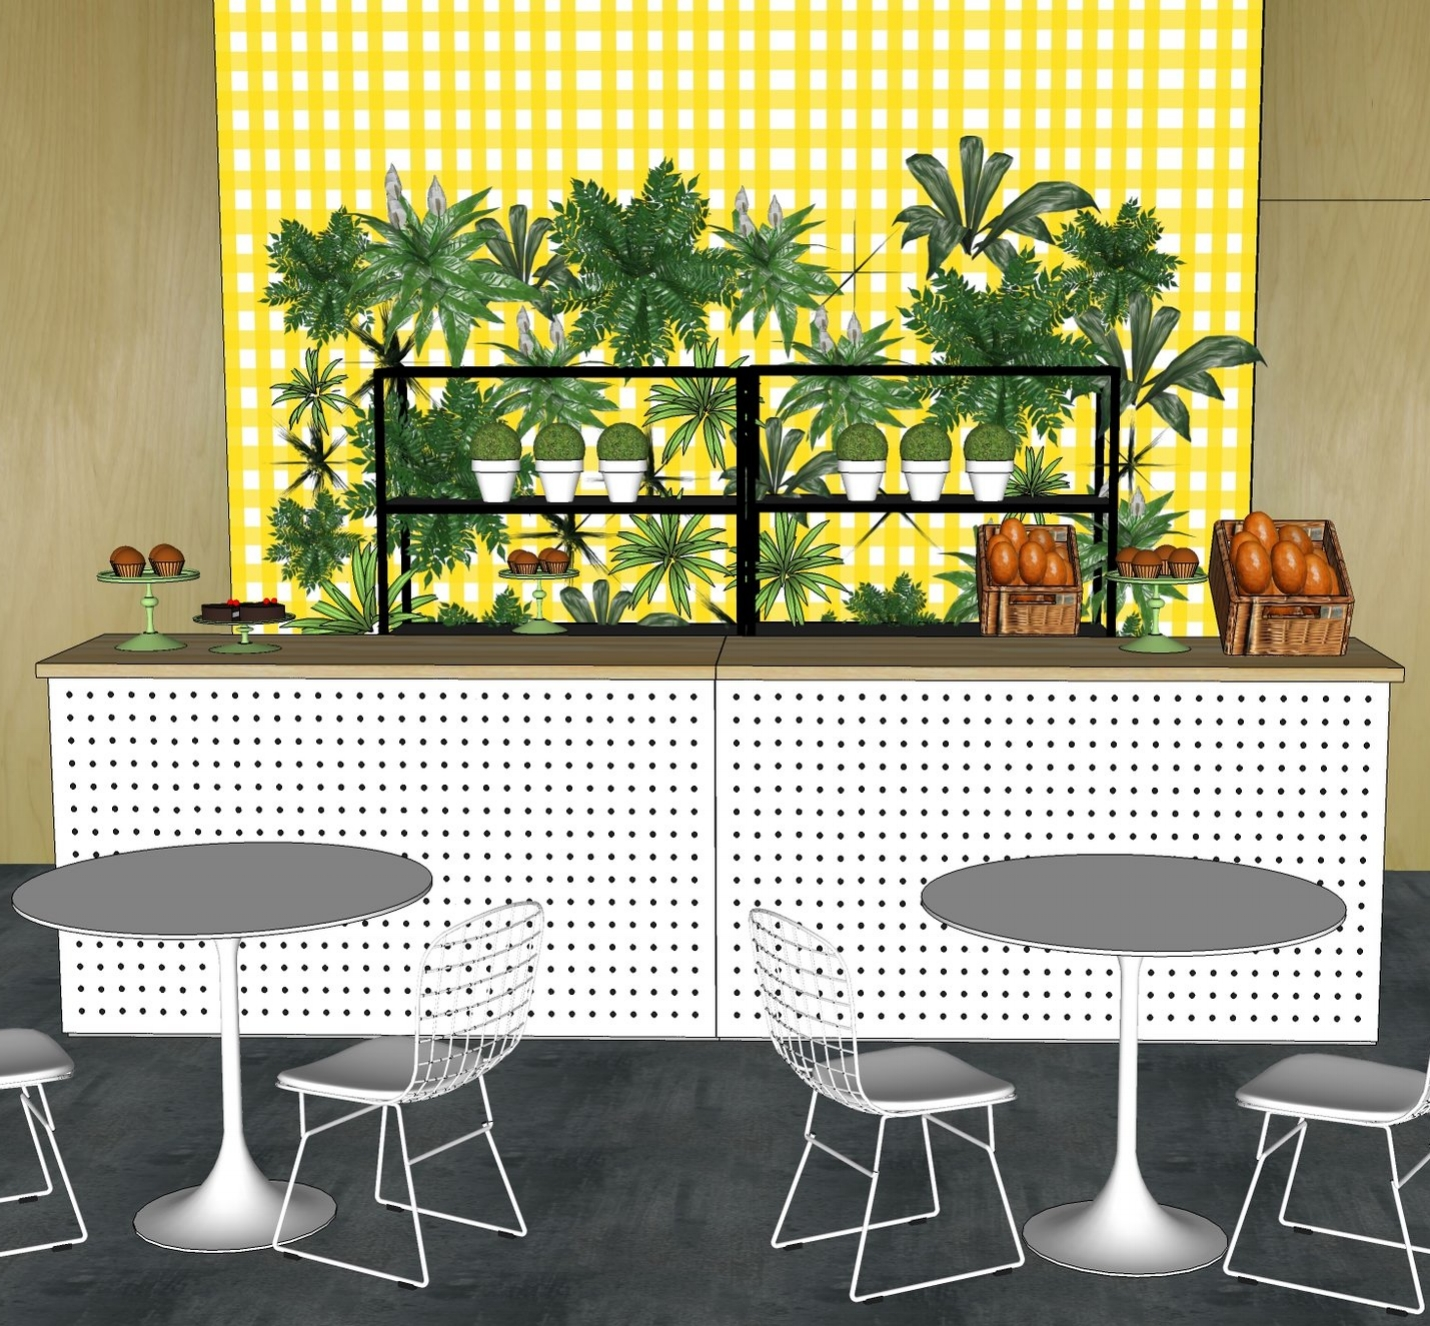 Ronen-Rental-Le-petiti-cafe-rent-the-look.jpg